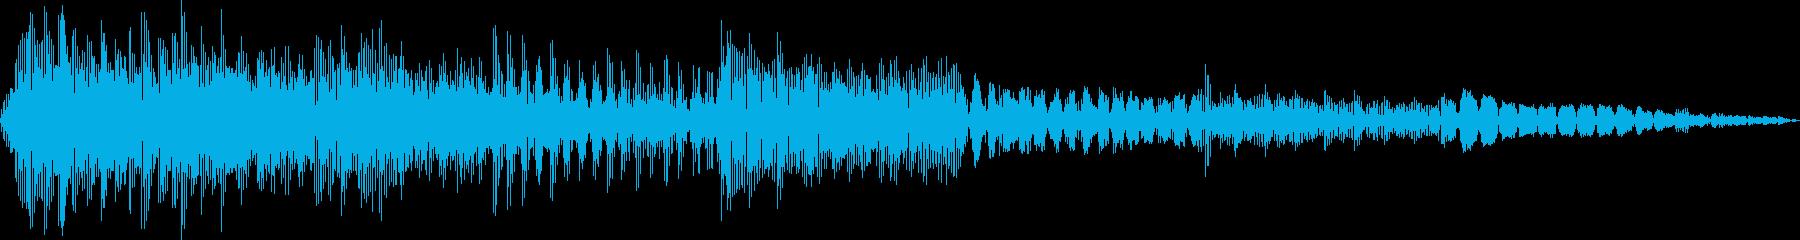 AMGアナログFX13の再生済みの波形